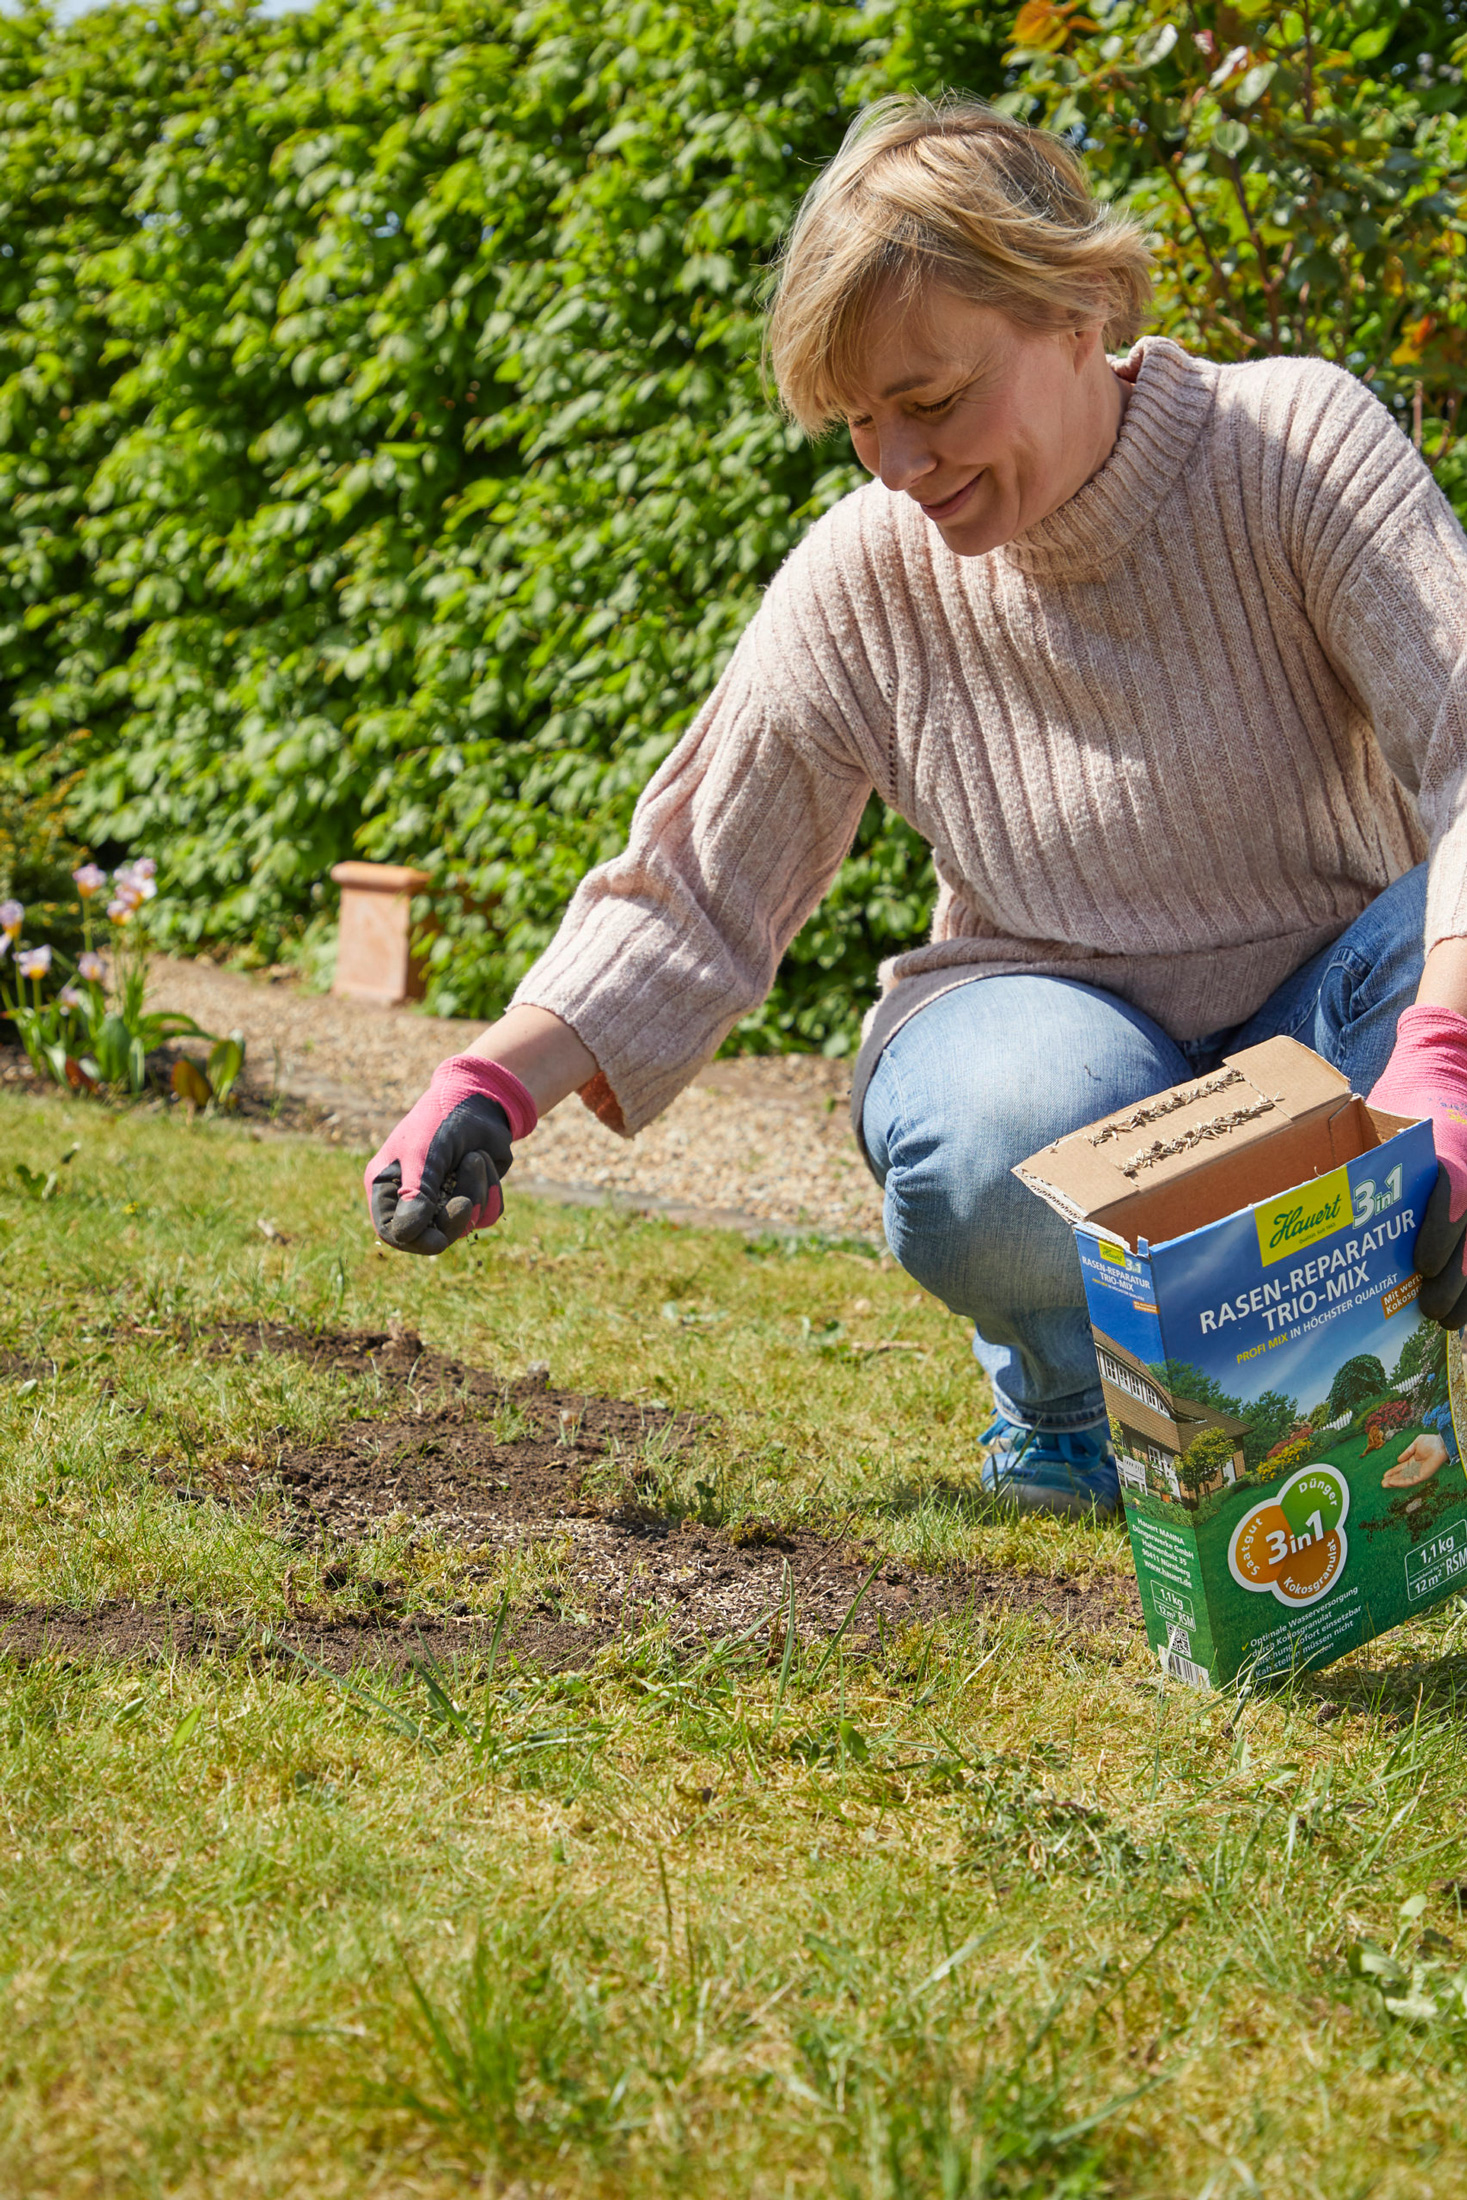 Frühjahrskur für den Rasen